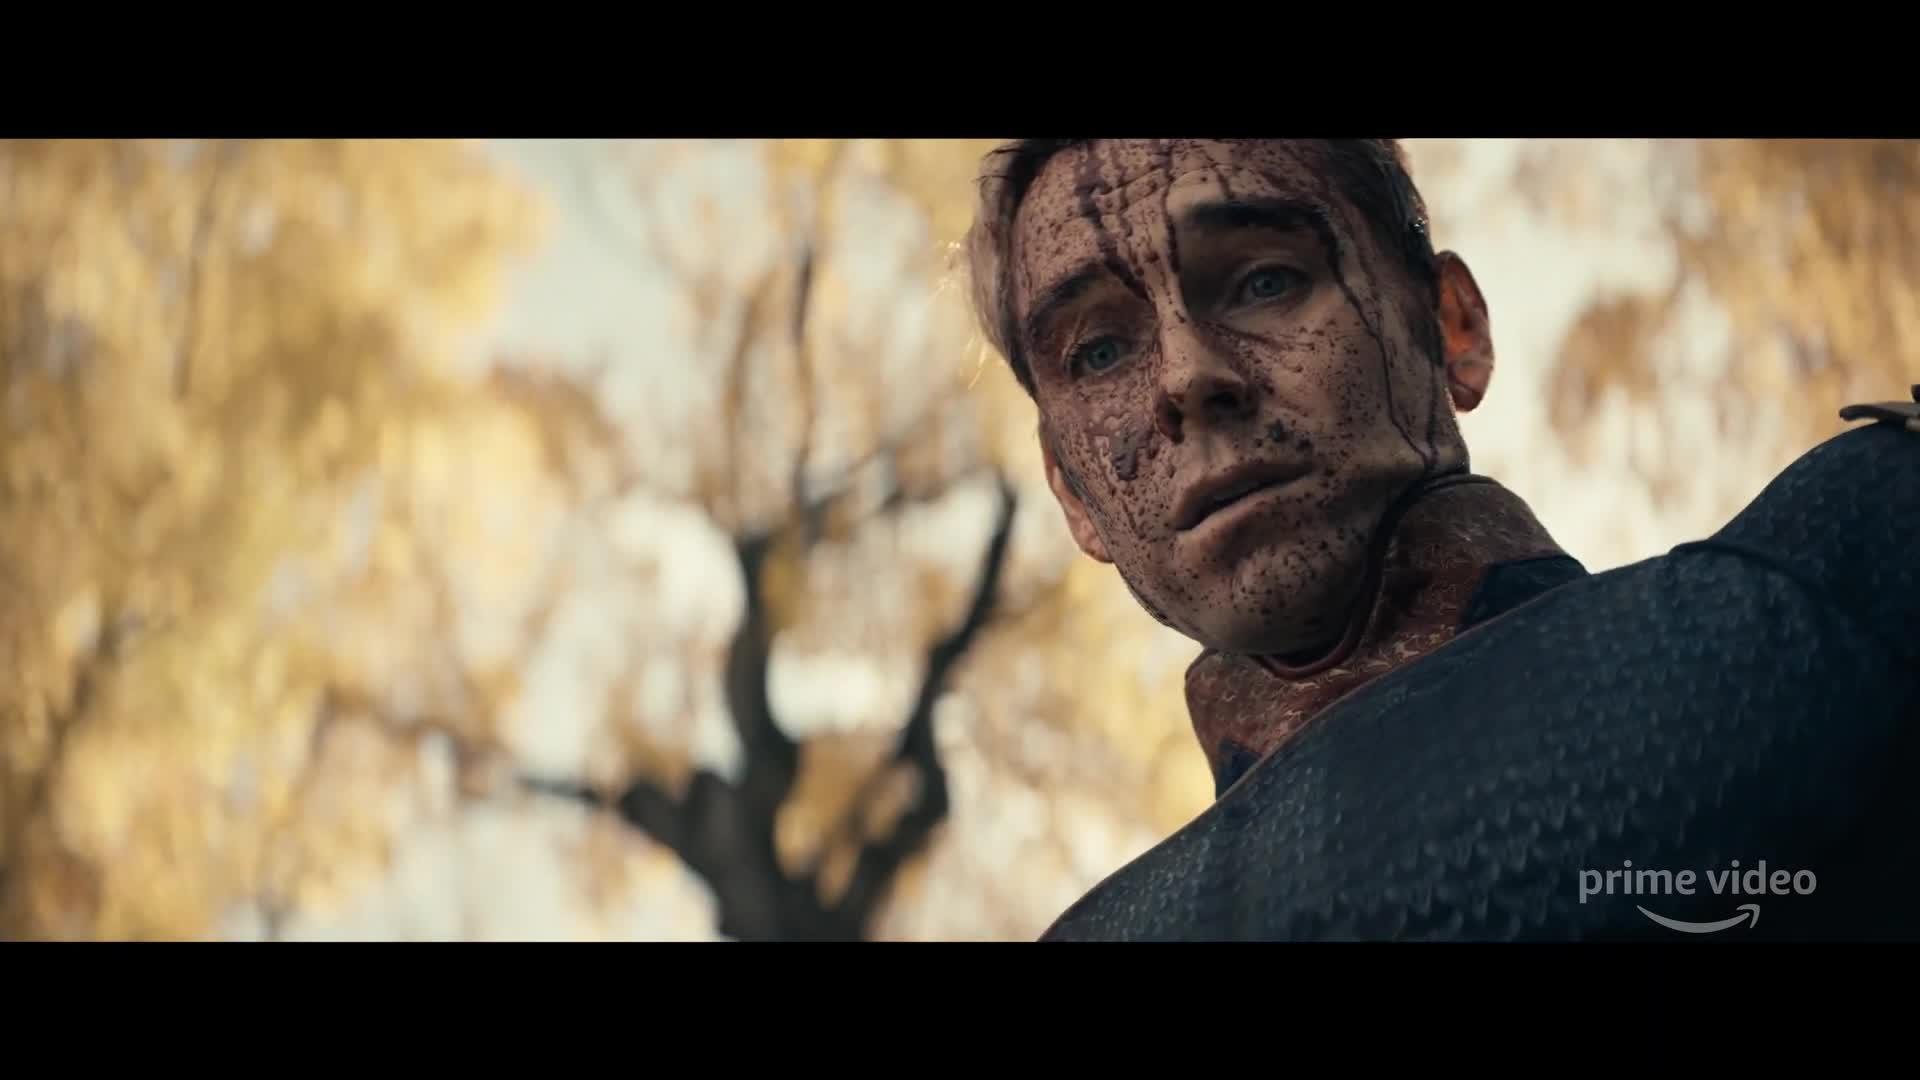 The Boys (Season 2) - Teaser Trailer [HD] screen capture